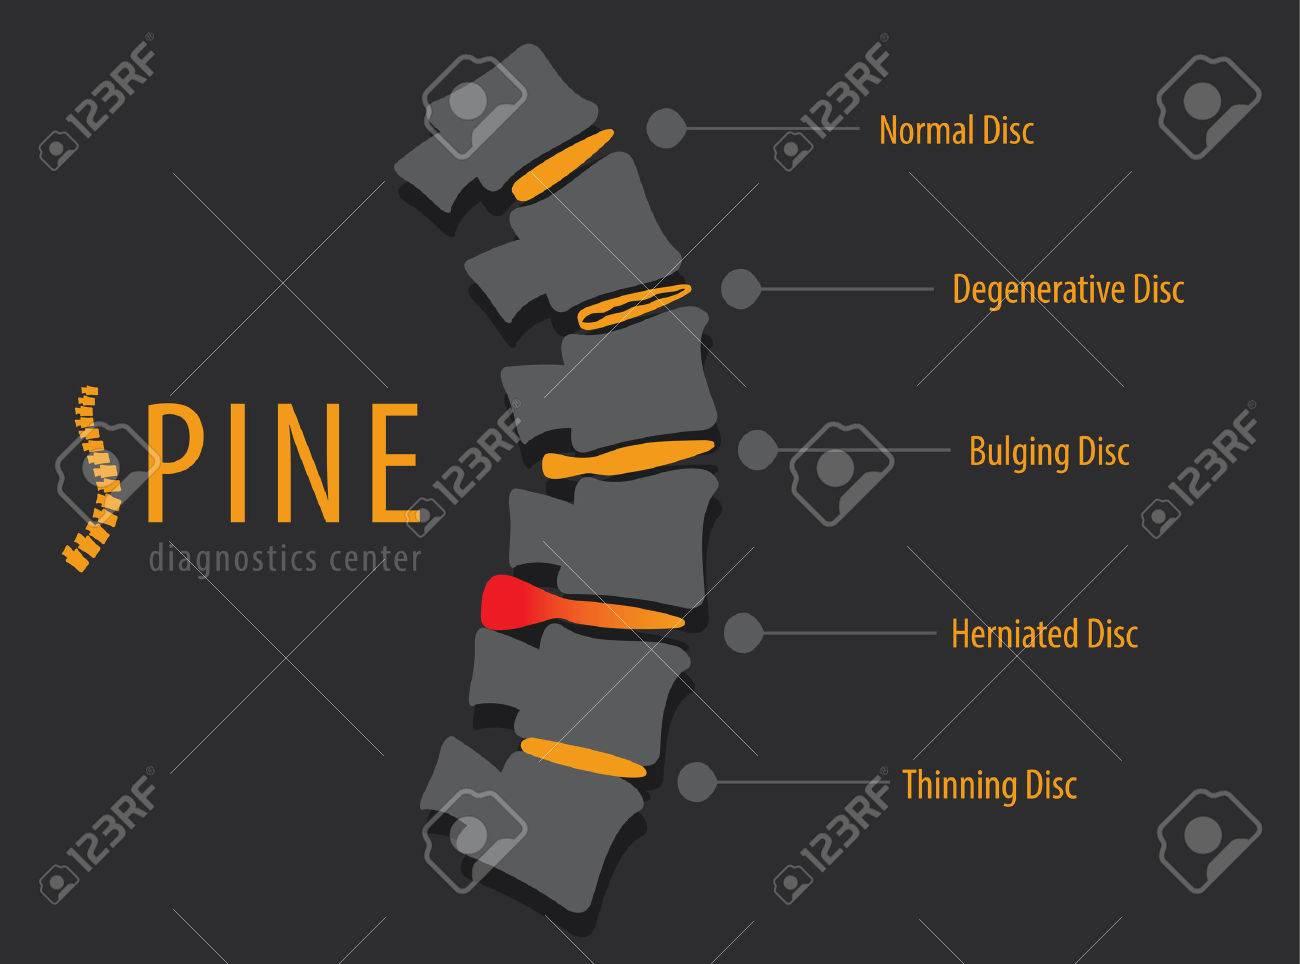 Spine anatomy disc degeneration, medical conceptual infographic vector illustration - 55942571